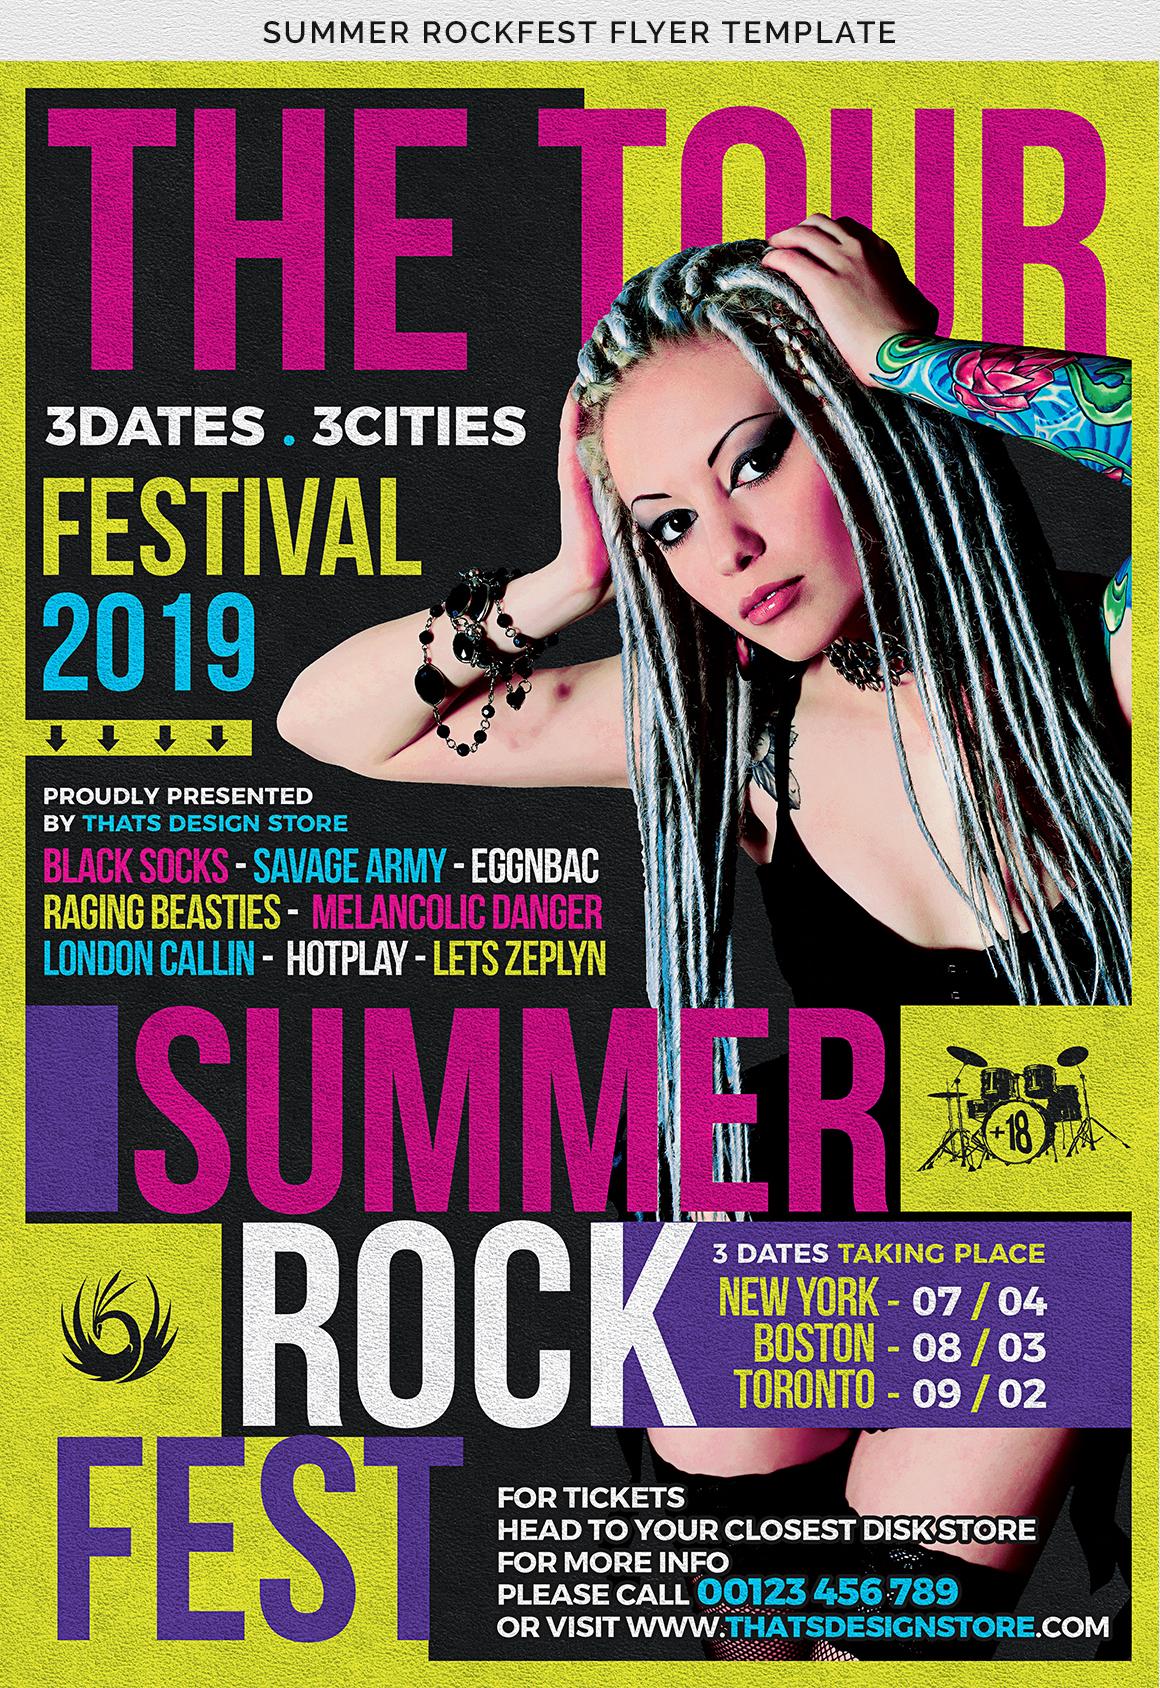 Summer Rockfest Flyer Template example image 7